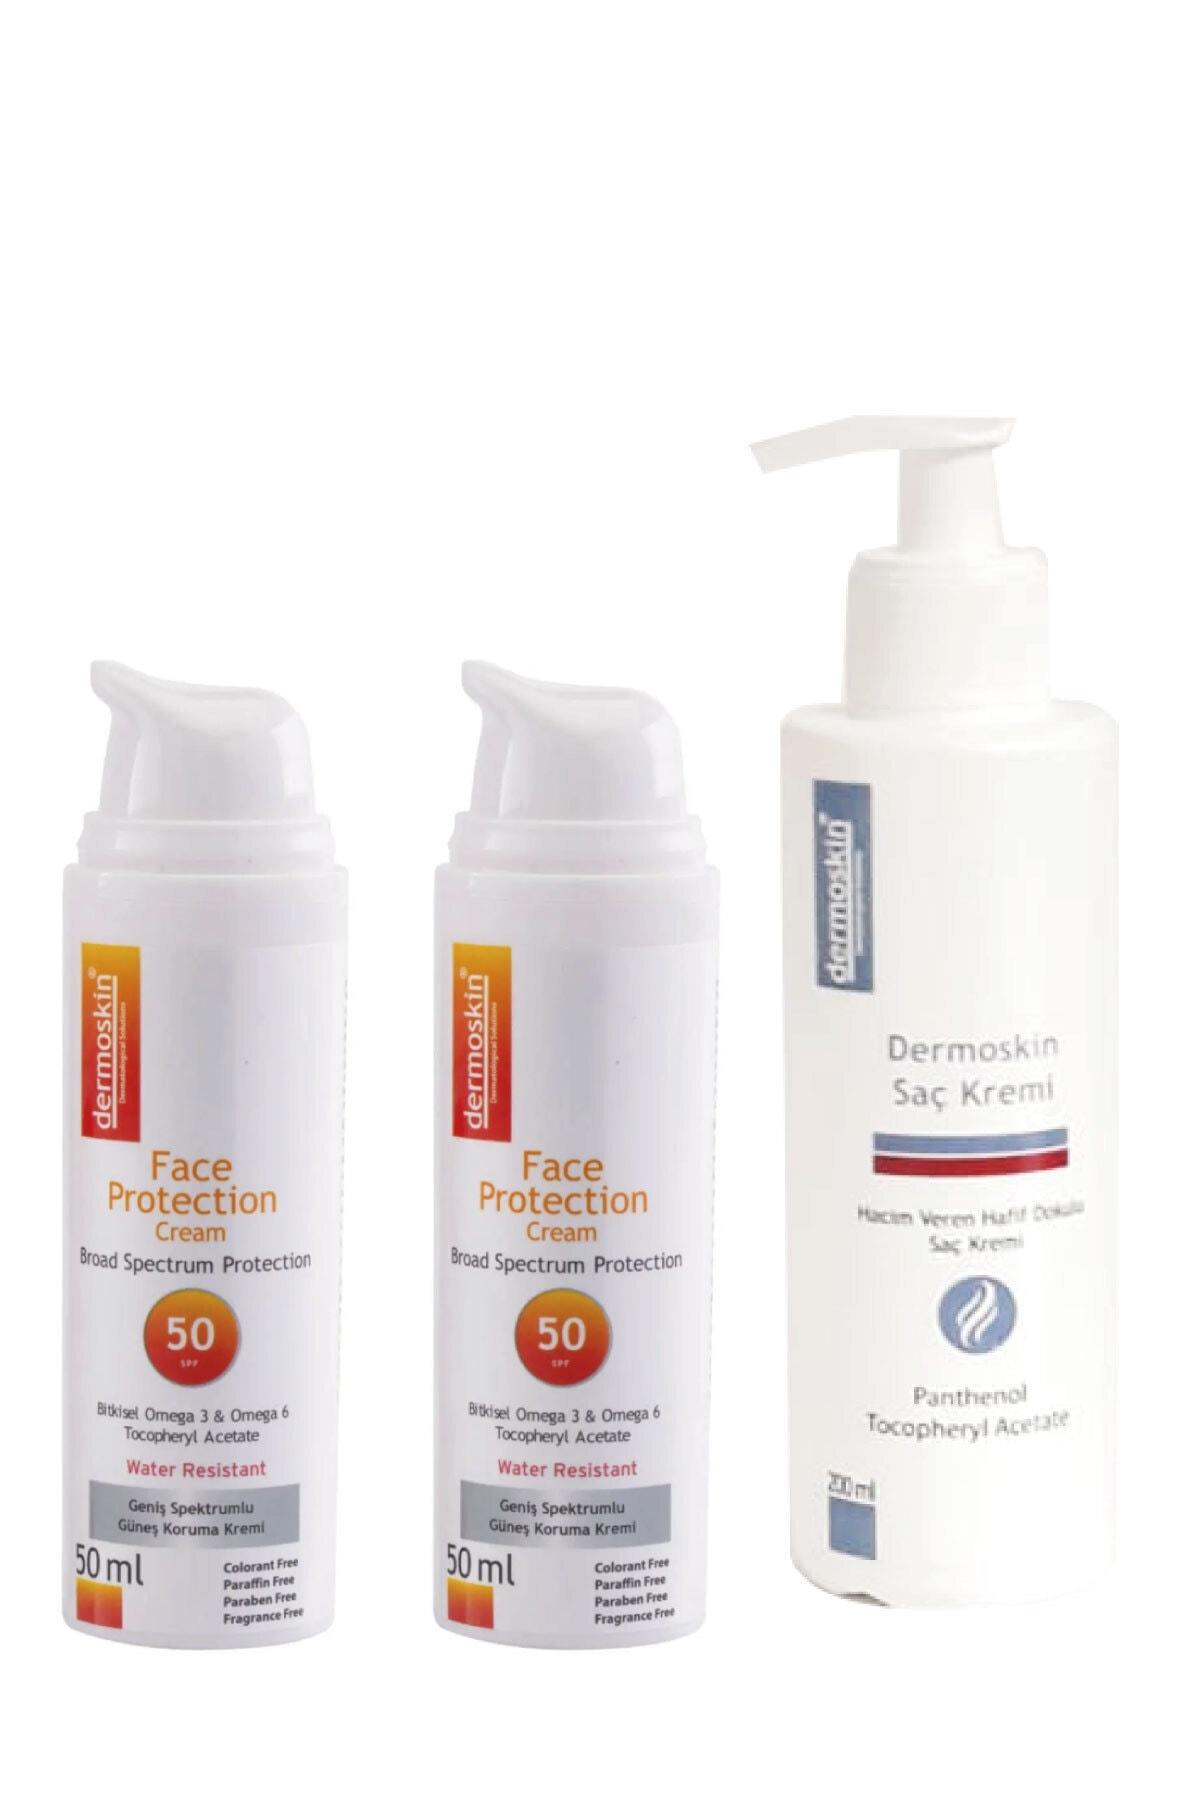 Face Protection Spf 50 -2'li Avantaj Paket + Saç Kremi Hediye